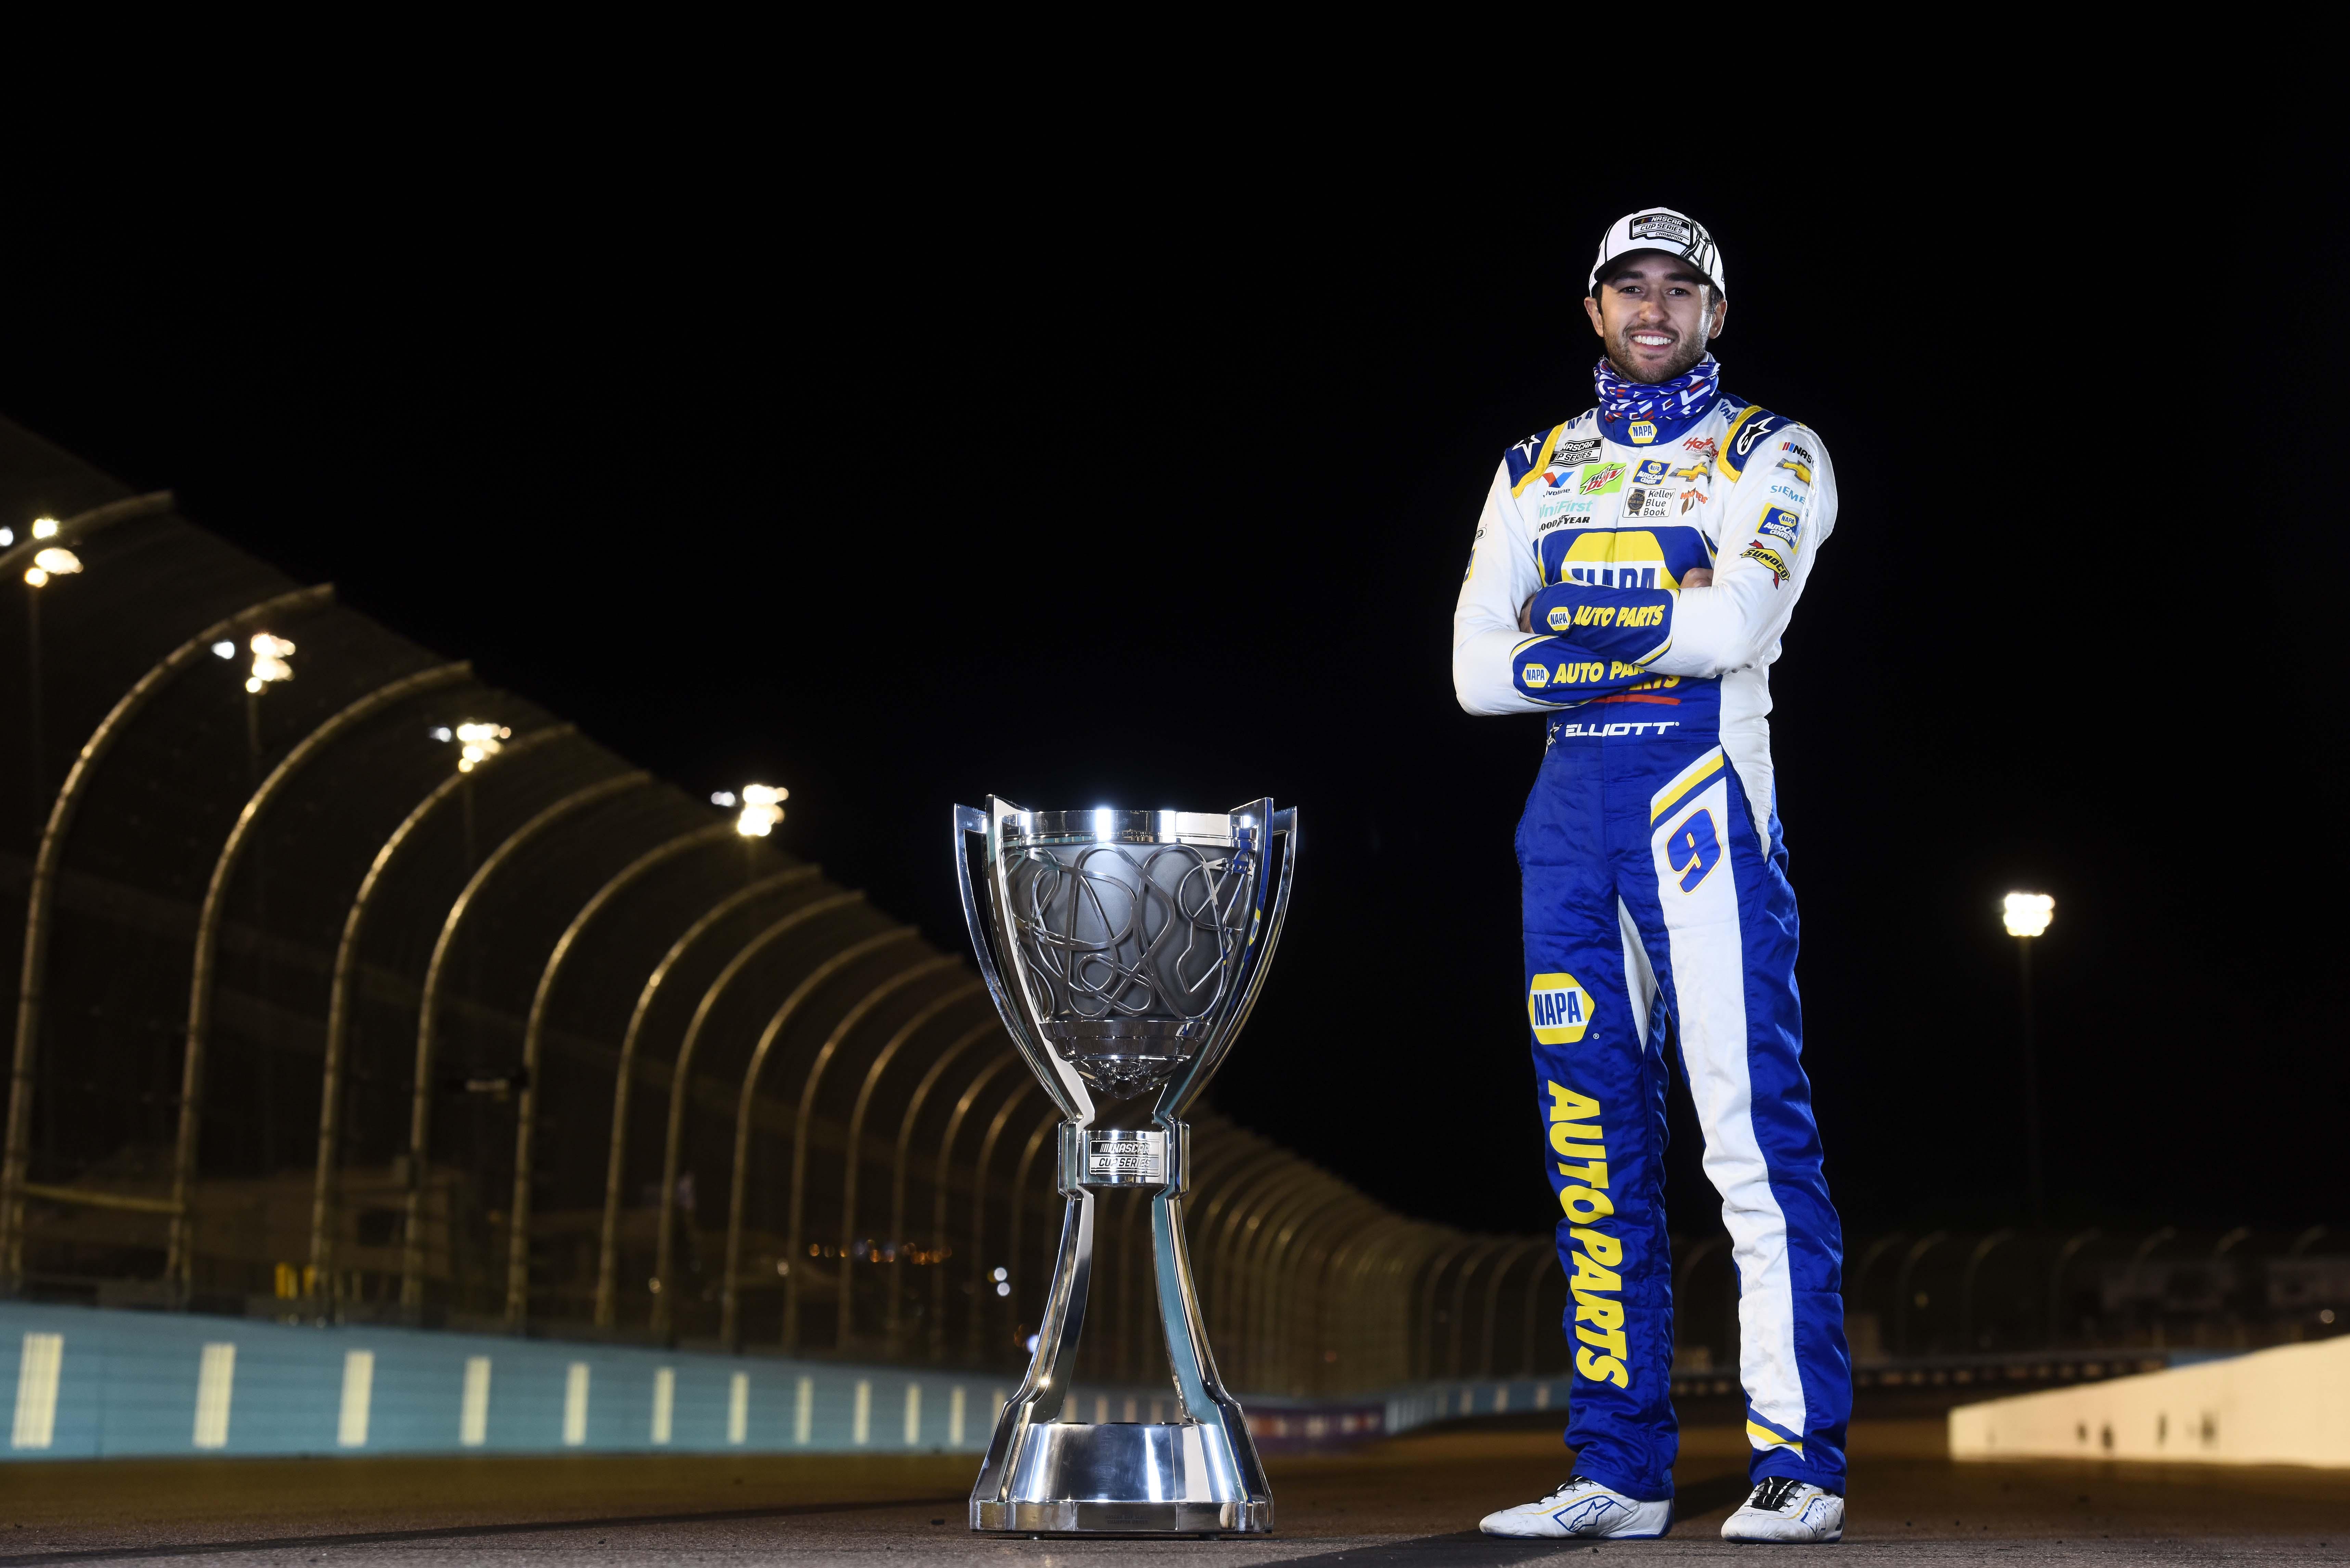 Chase Elliott - 2020 NASCAR Cup Series trophy